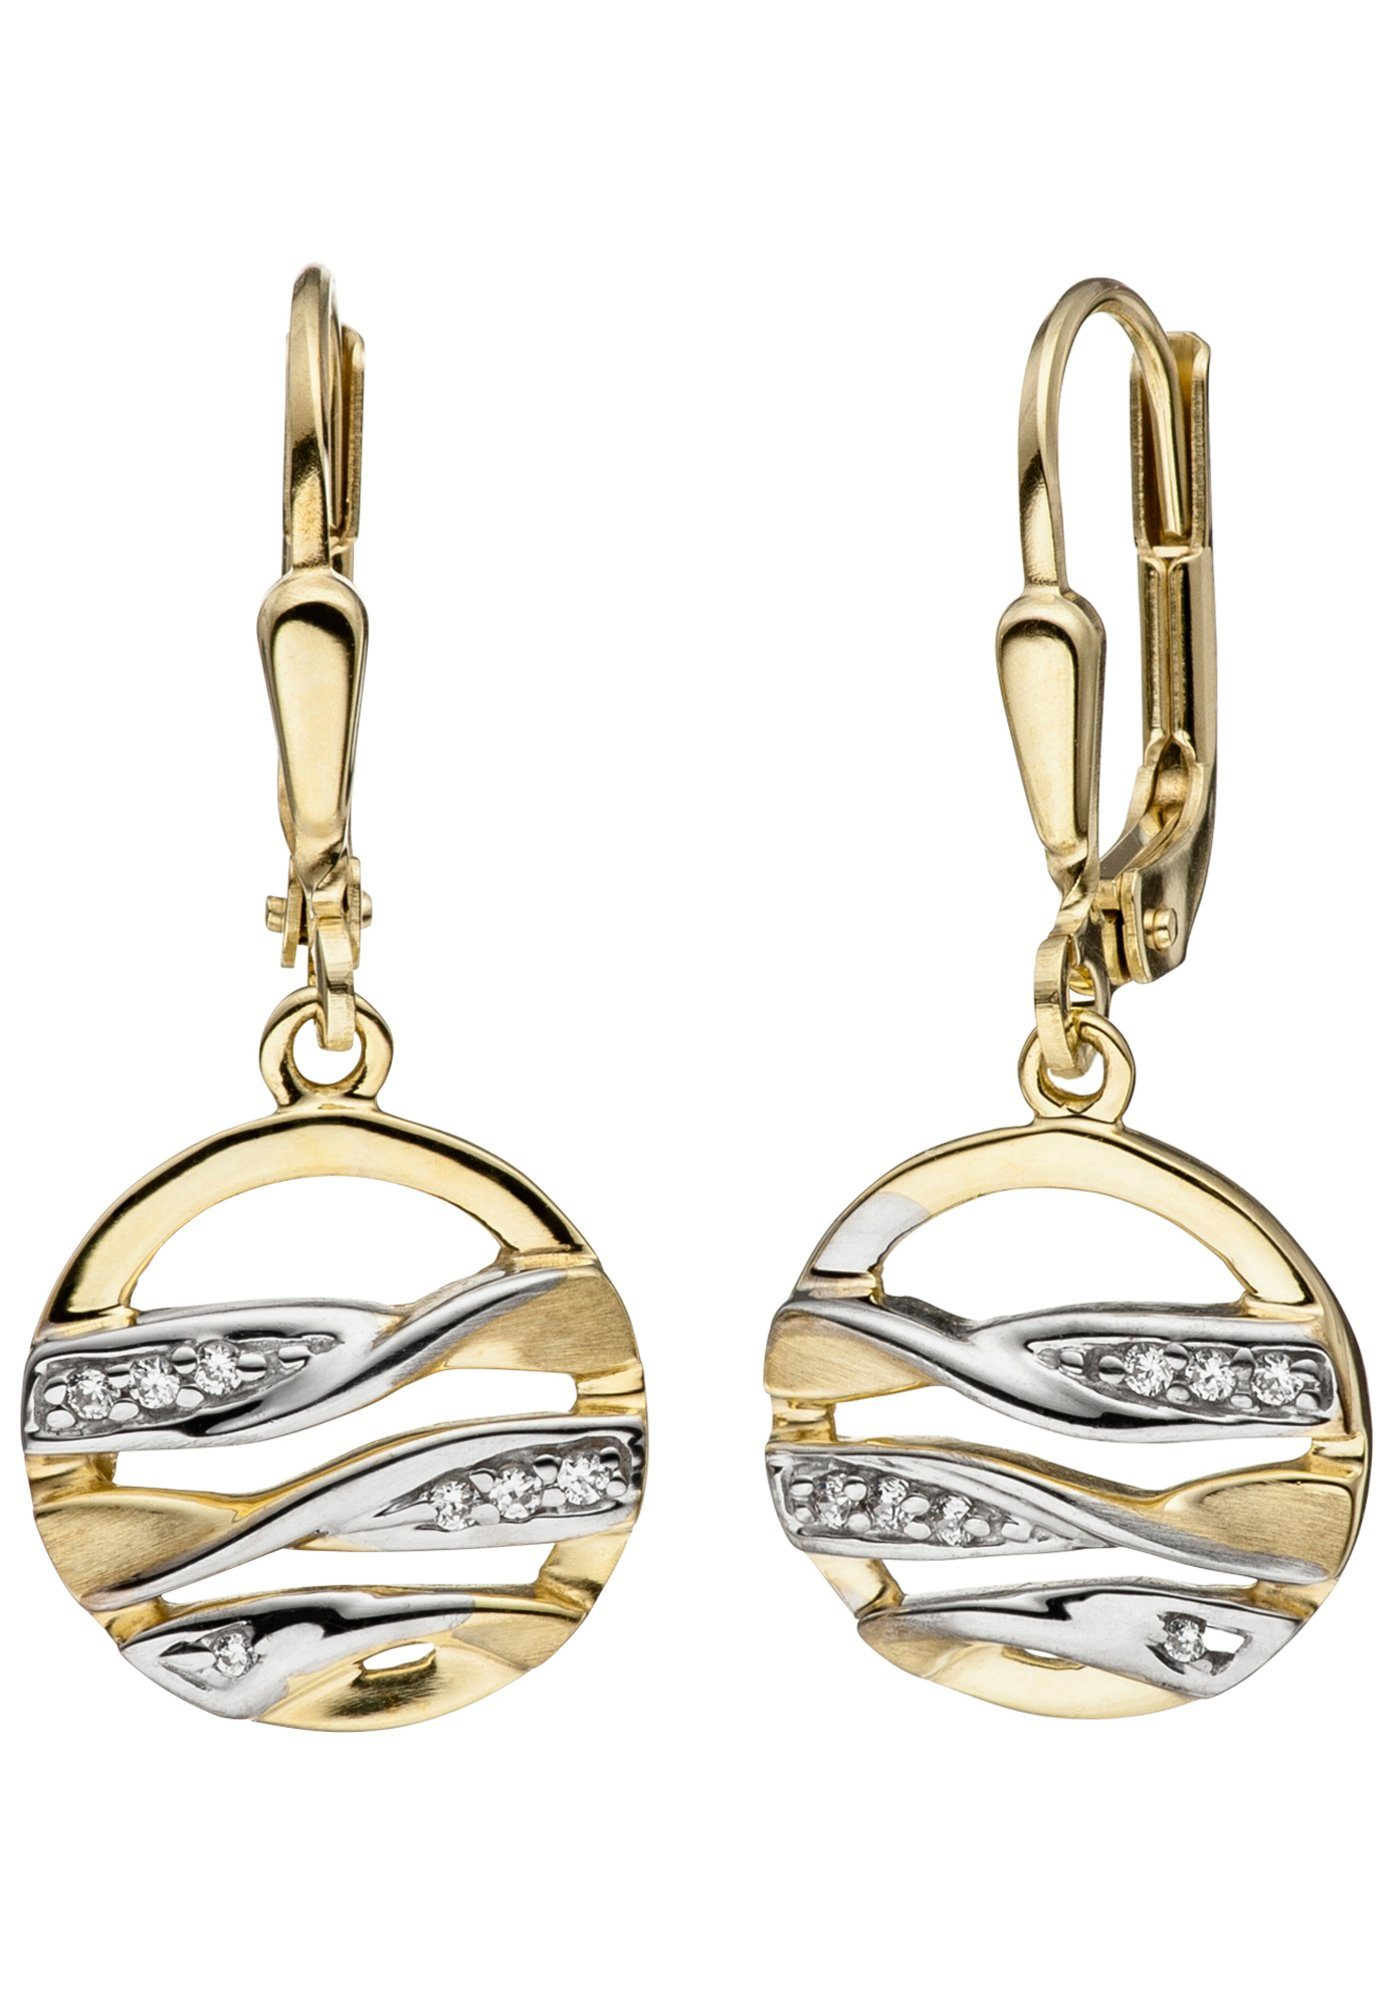 JOBO Paar Ohrhänger rund 333 Gold bicolor mit Zirkonia